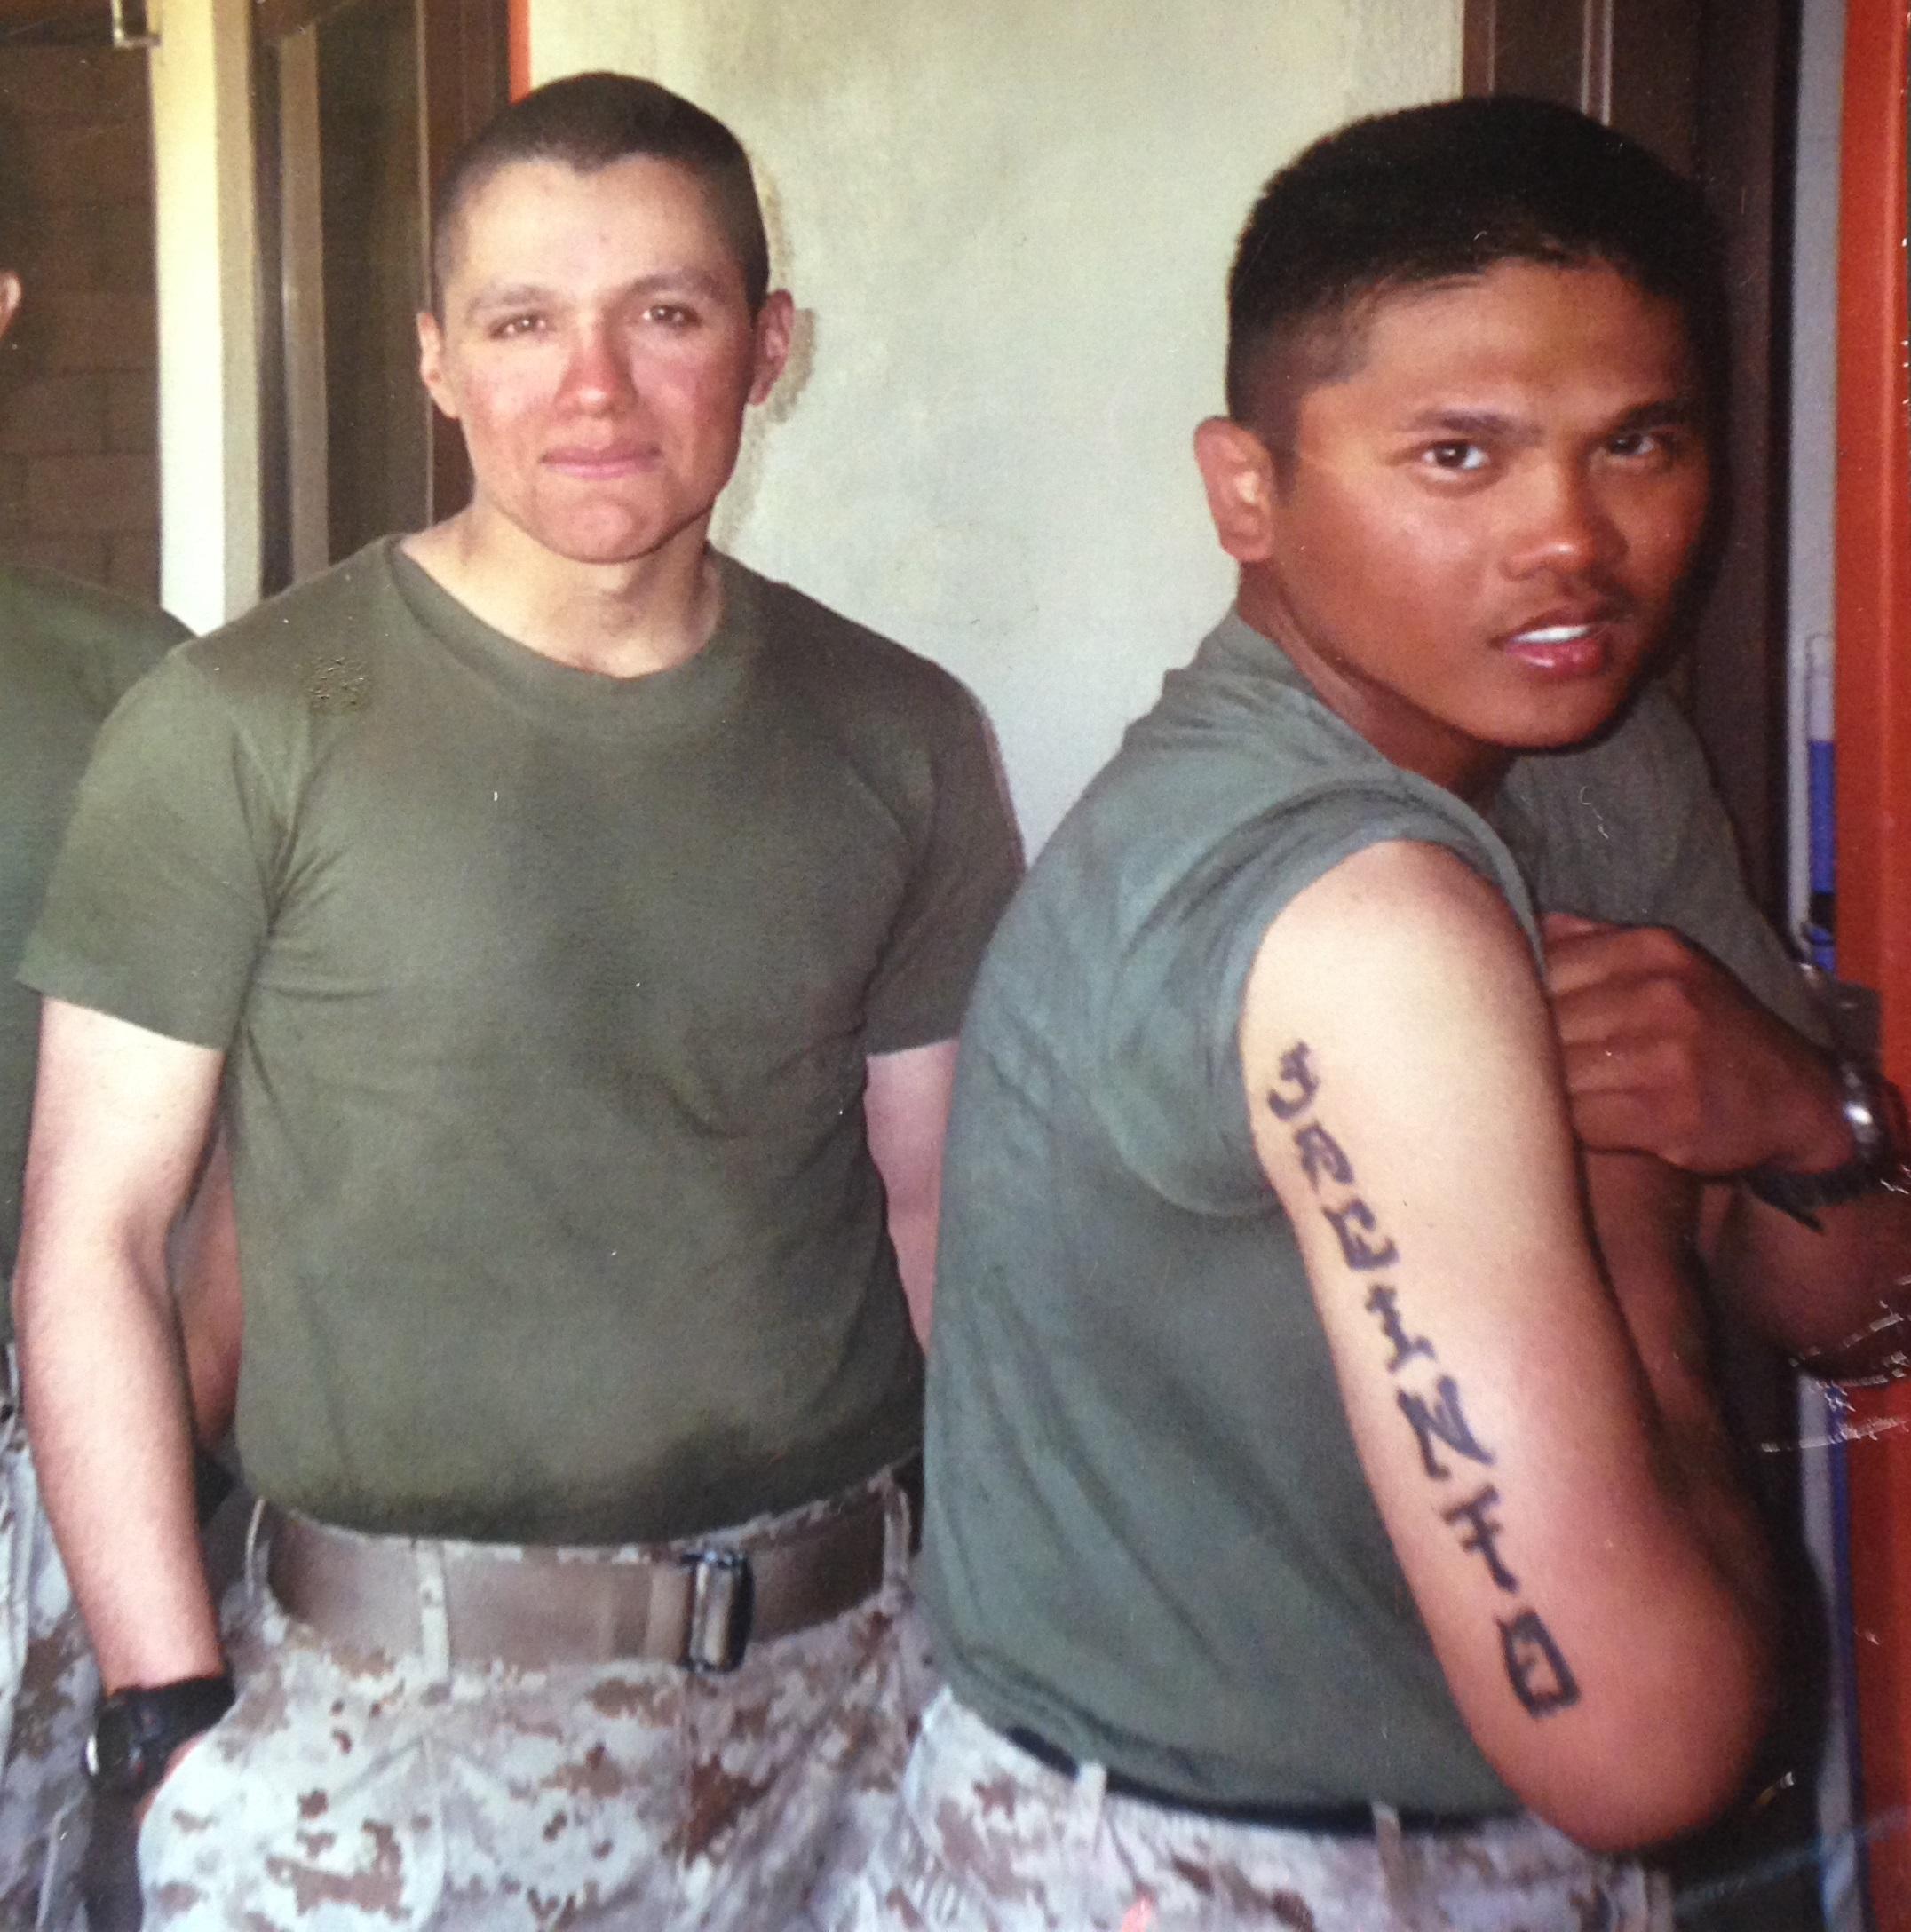 Oscar Garza (left) and Aaron Jacinto. Twentynine Palms, California. 2005. Photographer Unknown